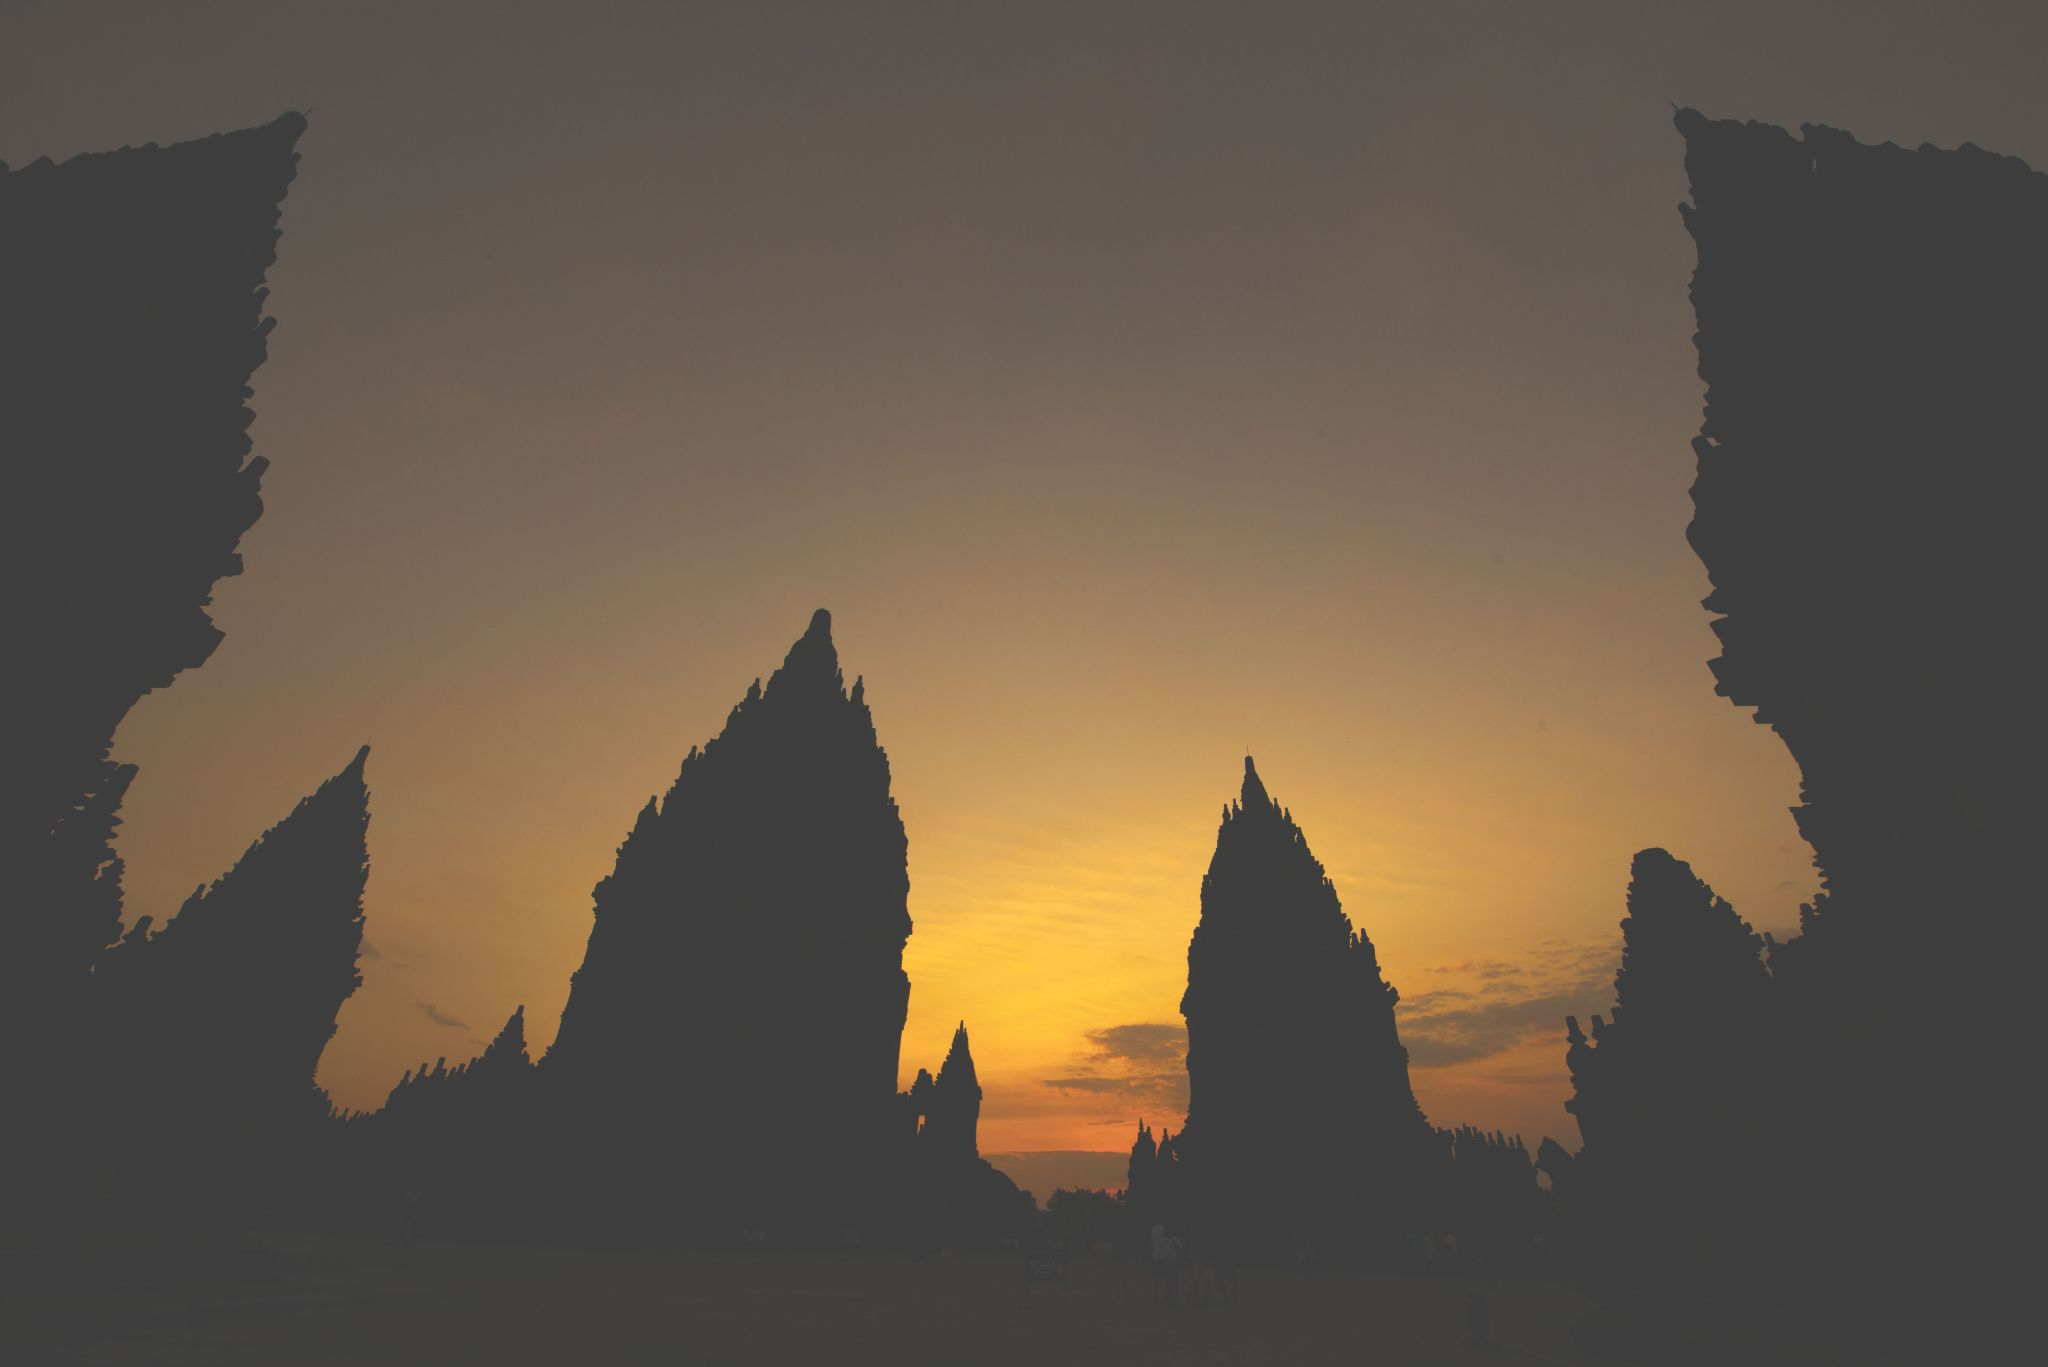 Prambanan Temple, Jogjakarta by eddylowck